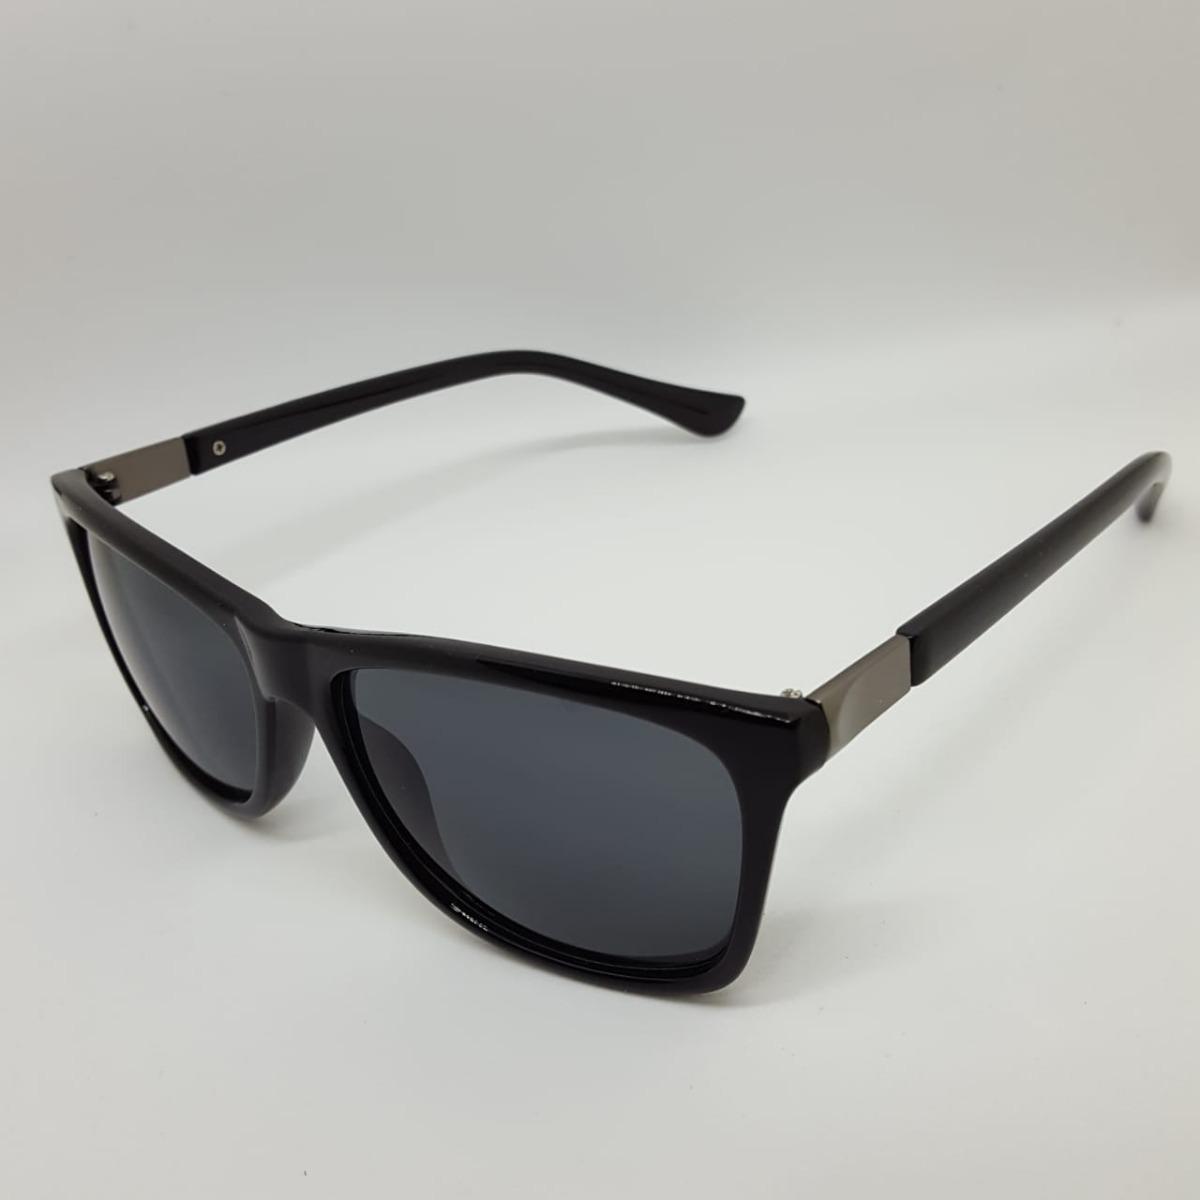 8745edc14 Óculos De Sol Masculino Black Proteção Uv-400 Super Barato - R$ 120 ...